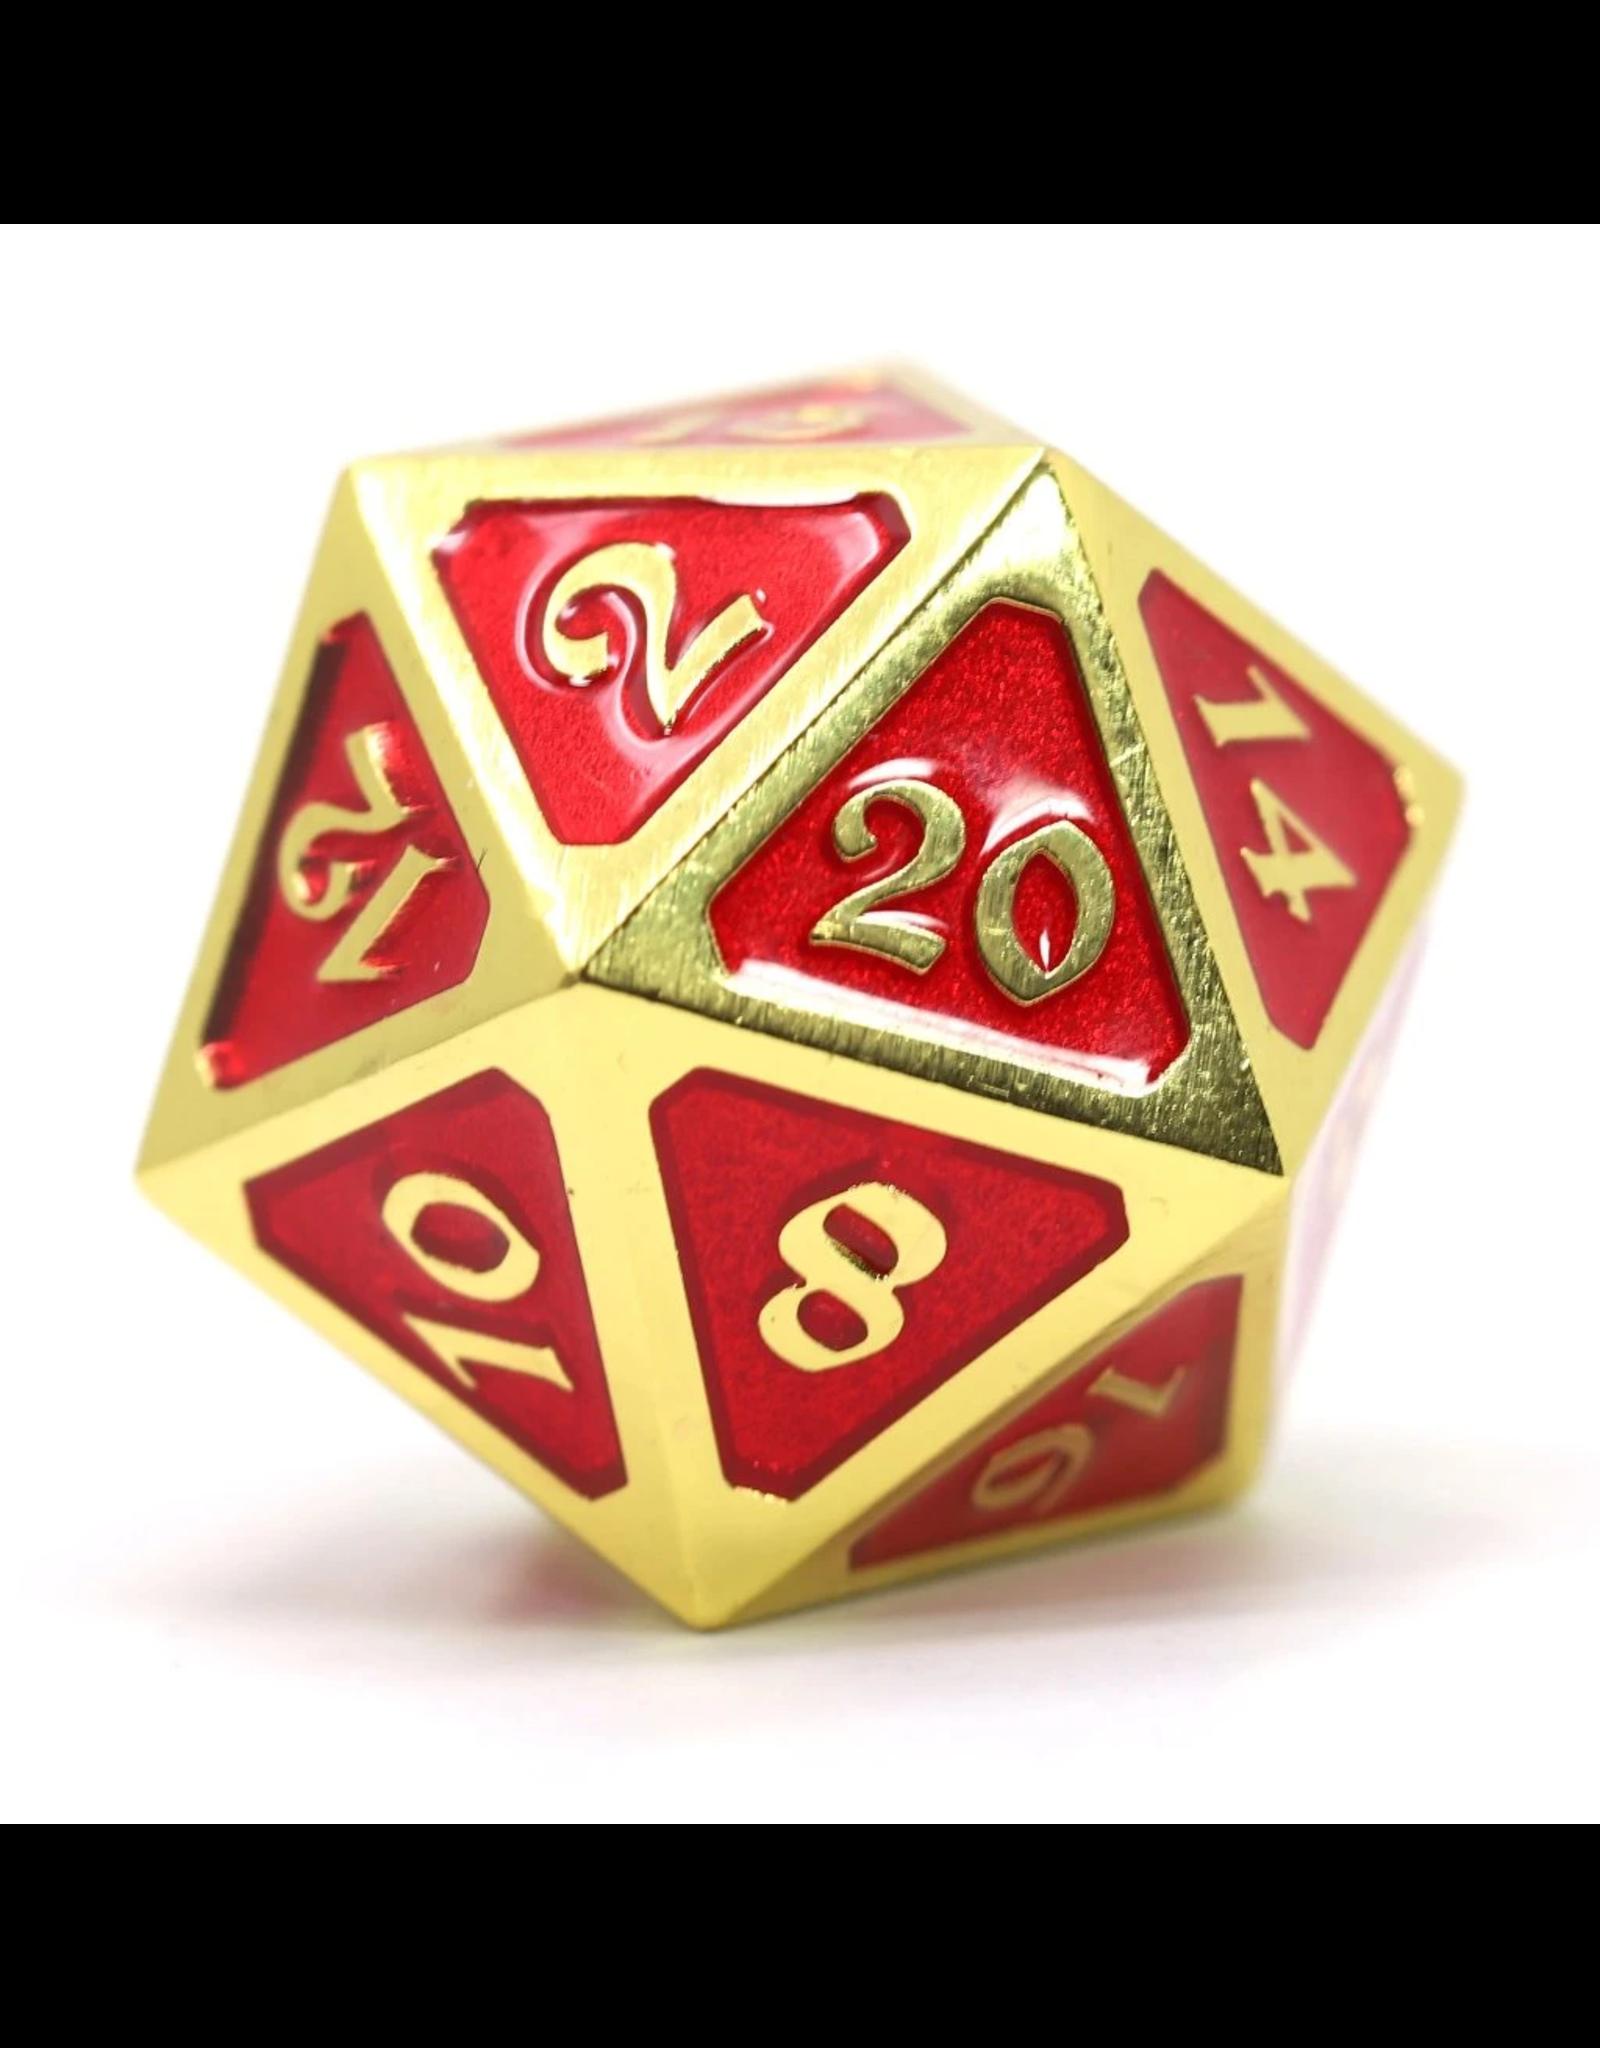 Die Hard Dice Die Hard Dice: Dire d20 Mythica Gold Ruby